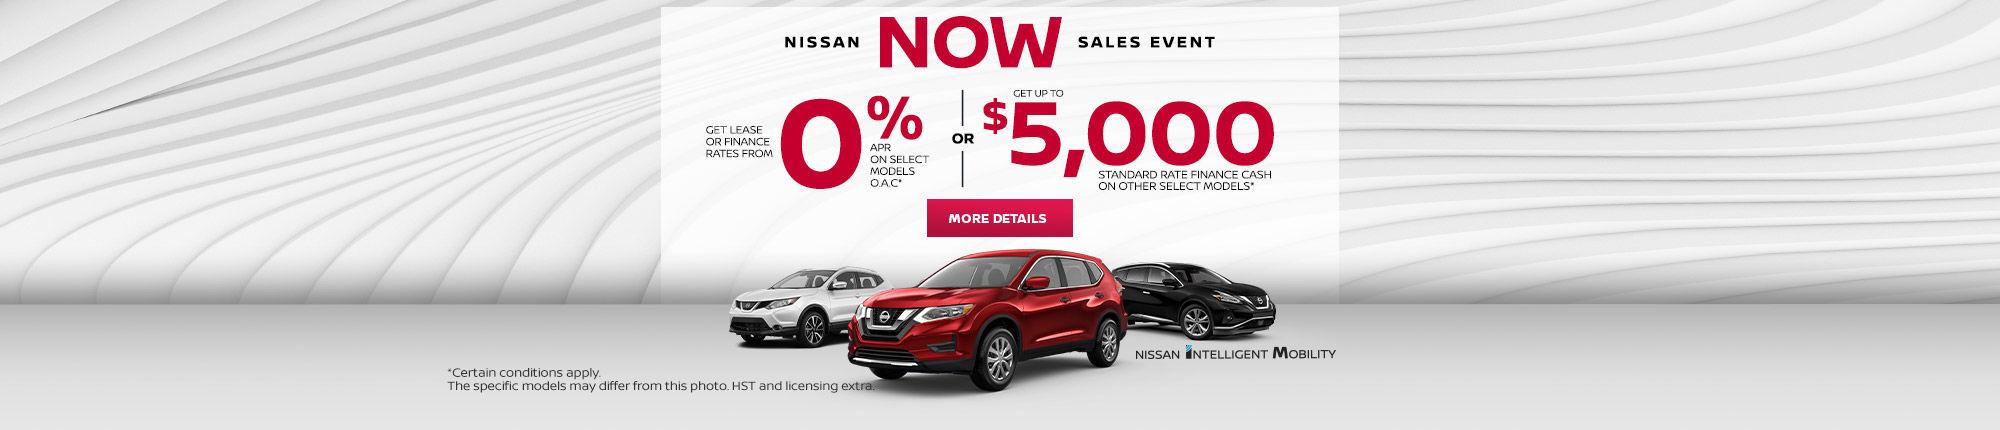 Nissan Flash Sale